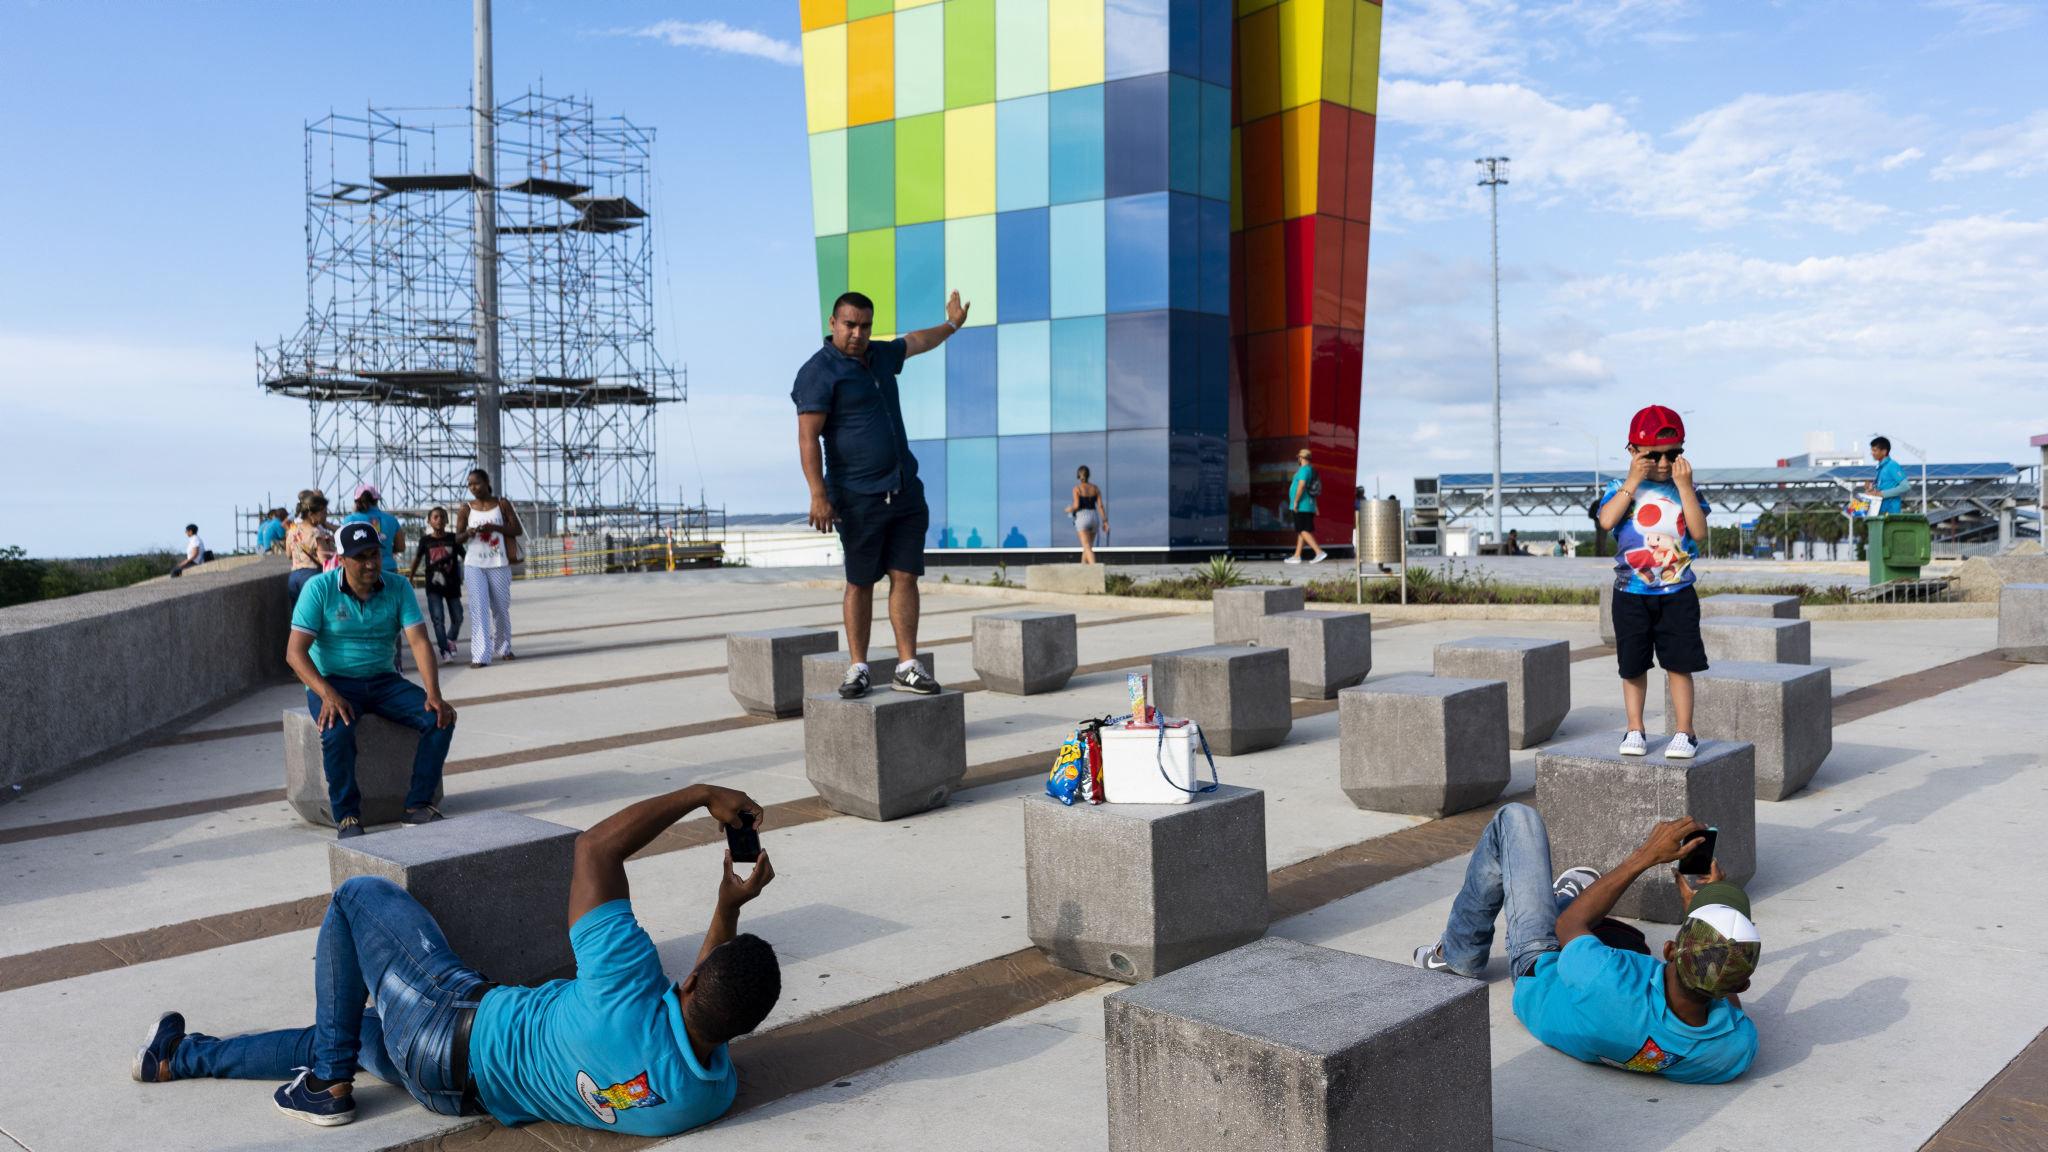 Colombia's Atlantic coast: a poor relation starts to prosper